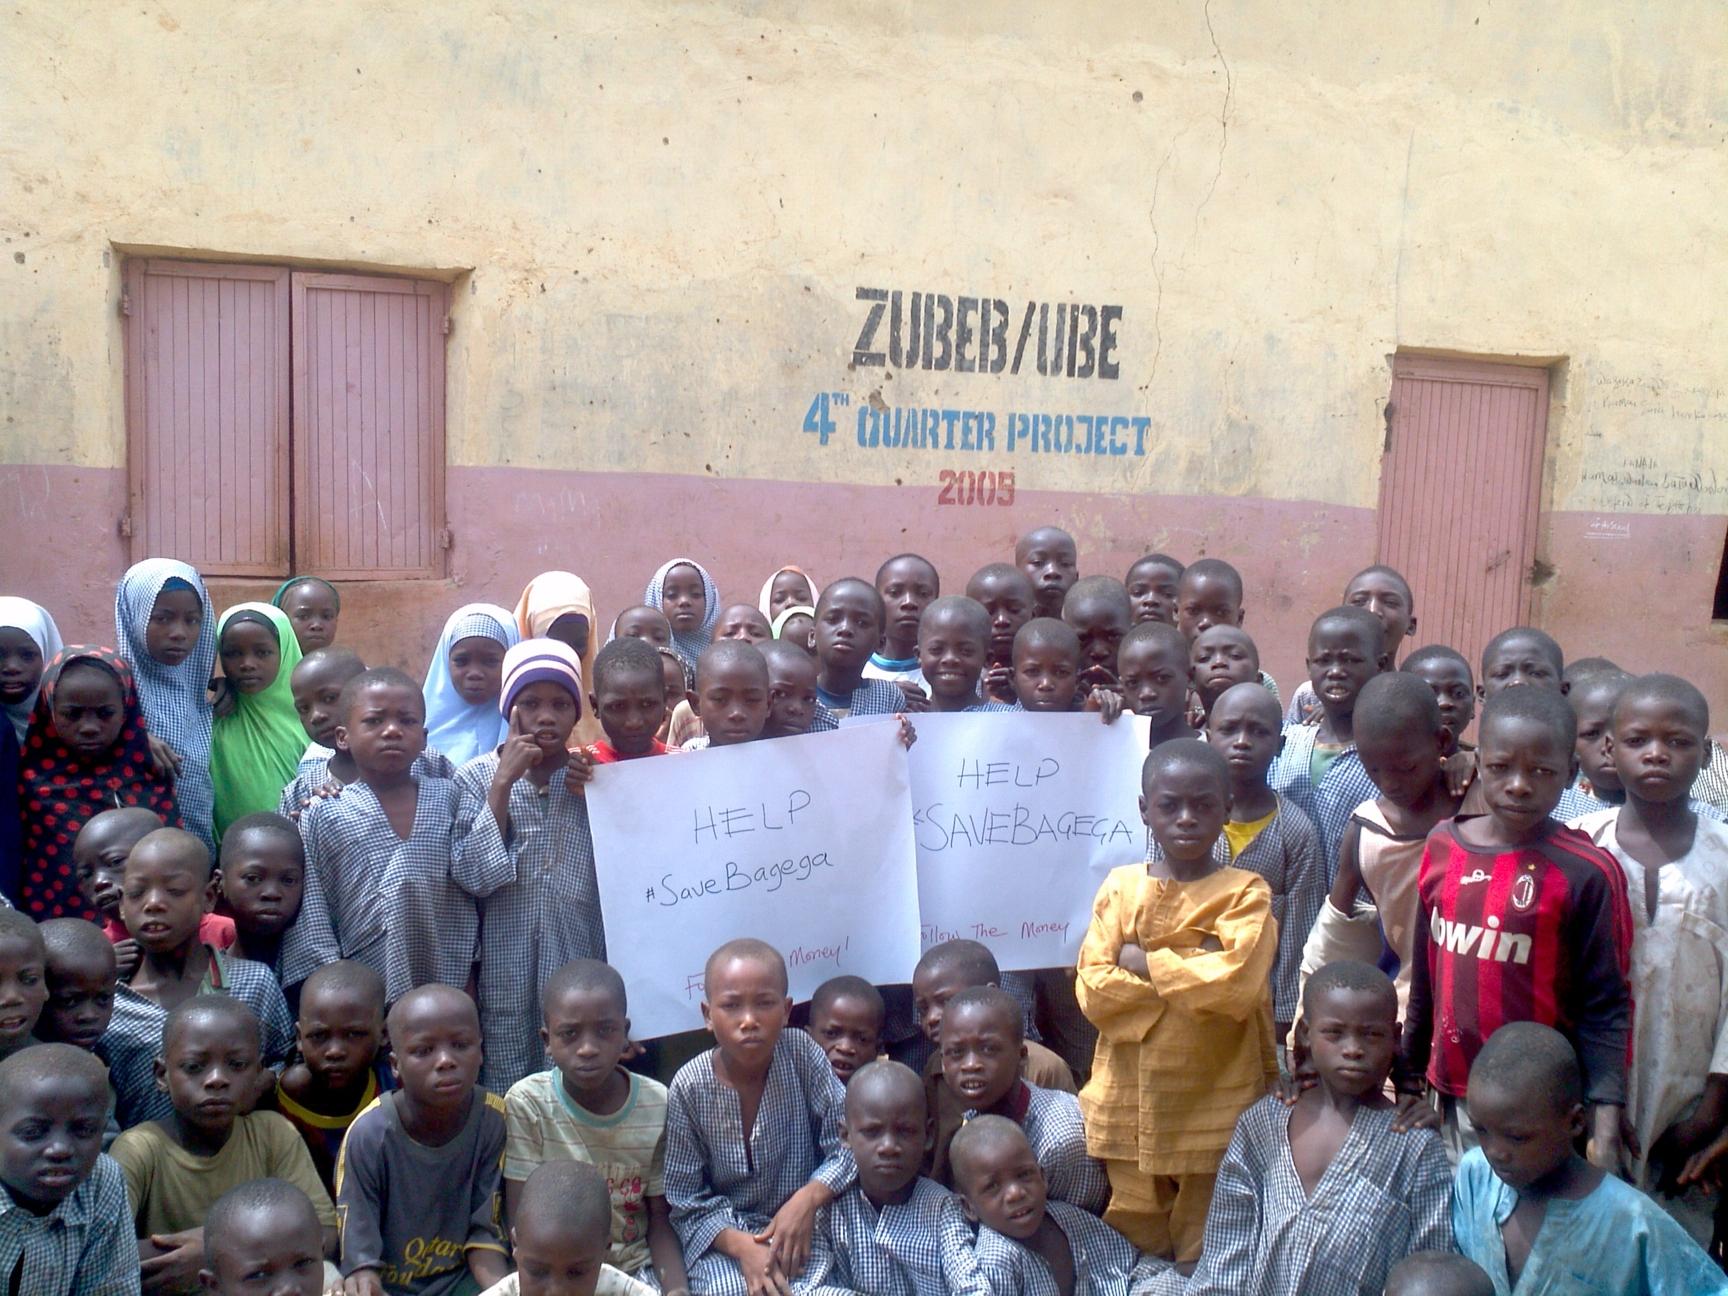 How we Tracked 837.3 million NGN to #SaveBagega in Zamfara State